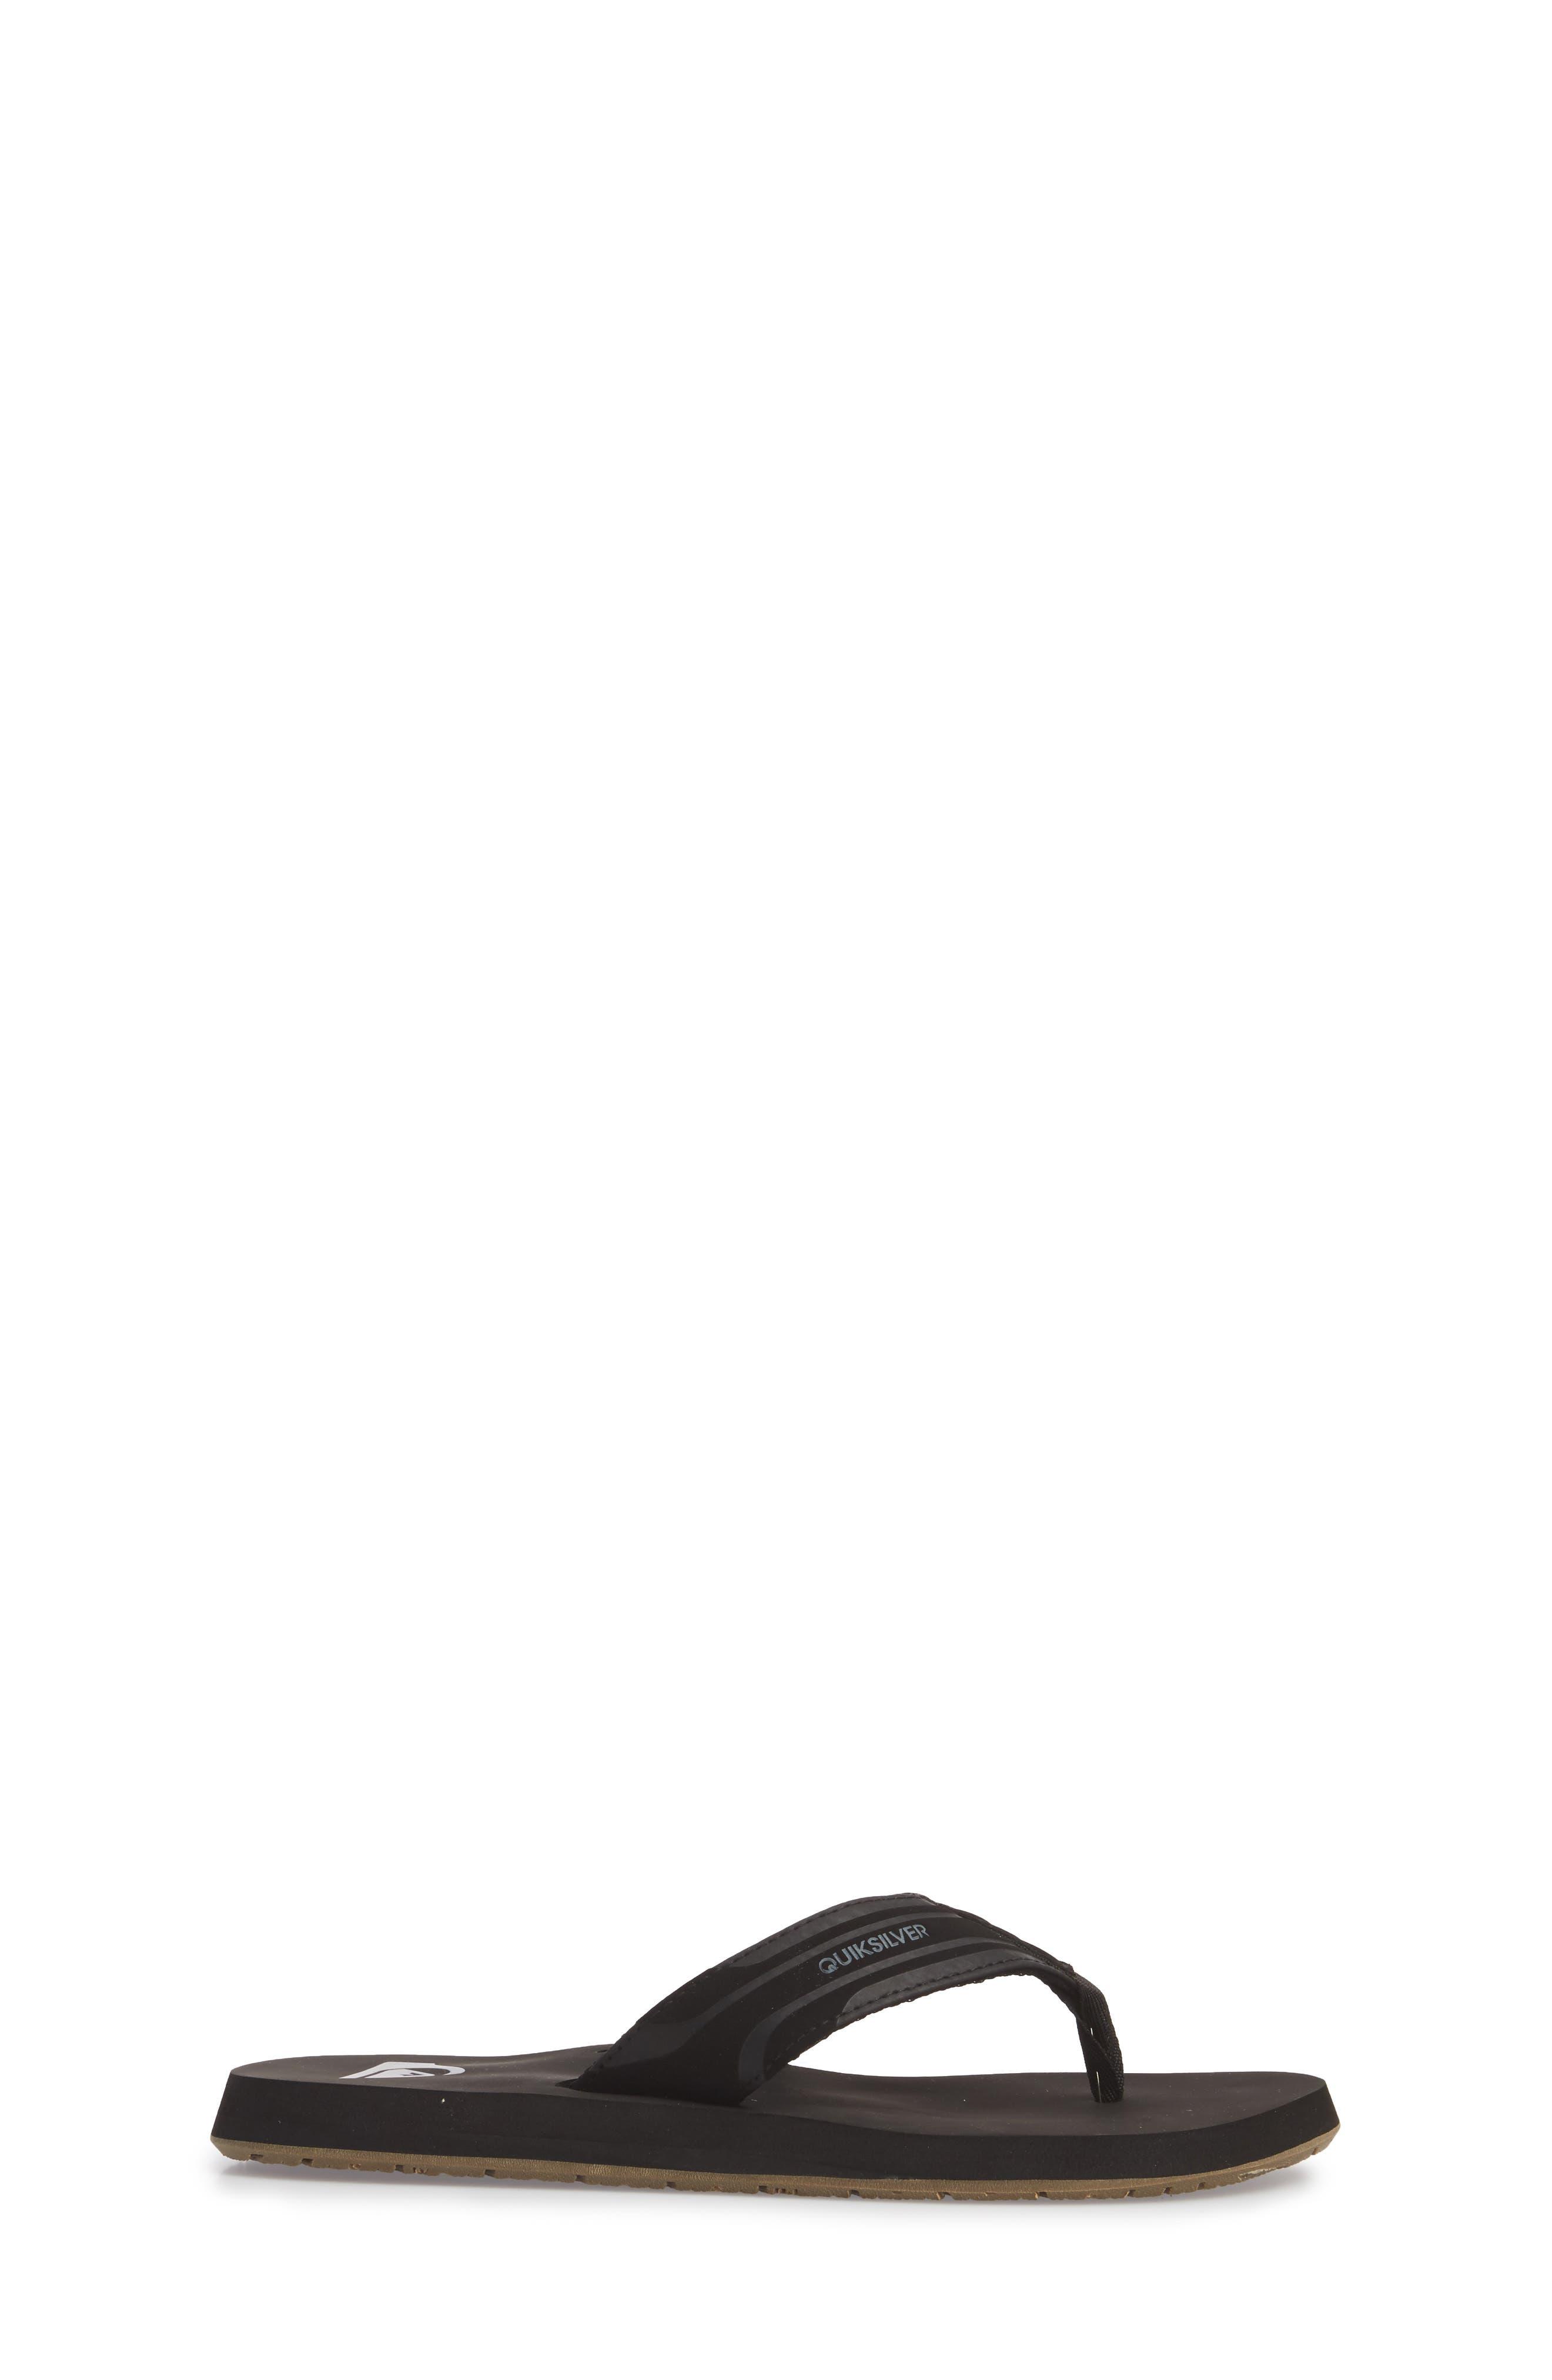 QUIKSILVER, Monkey Wrench Flip Flop, Alternate thumbnail 3, color, BLACK/ BROWN